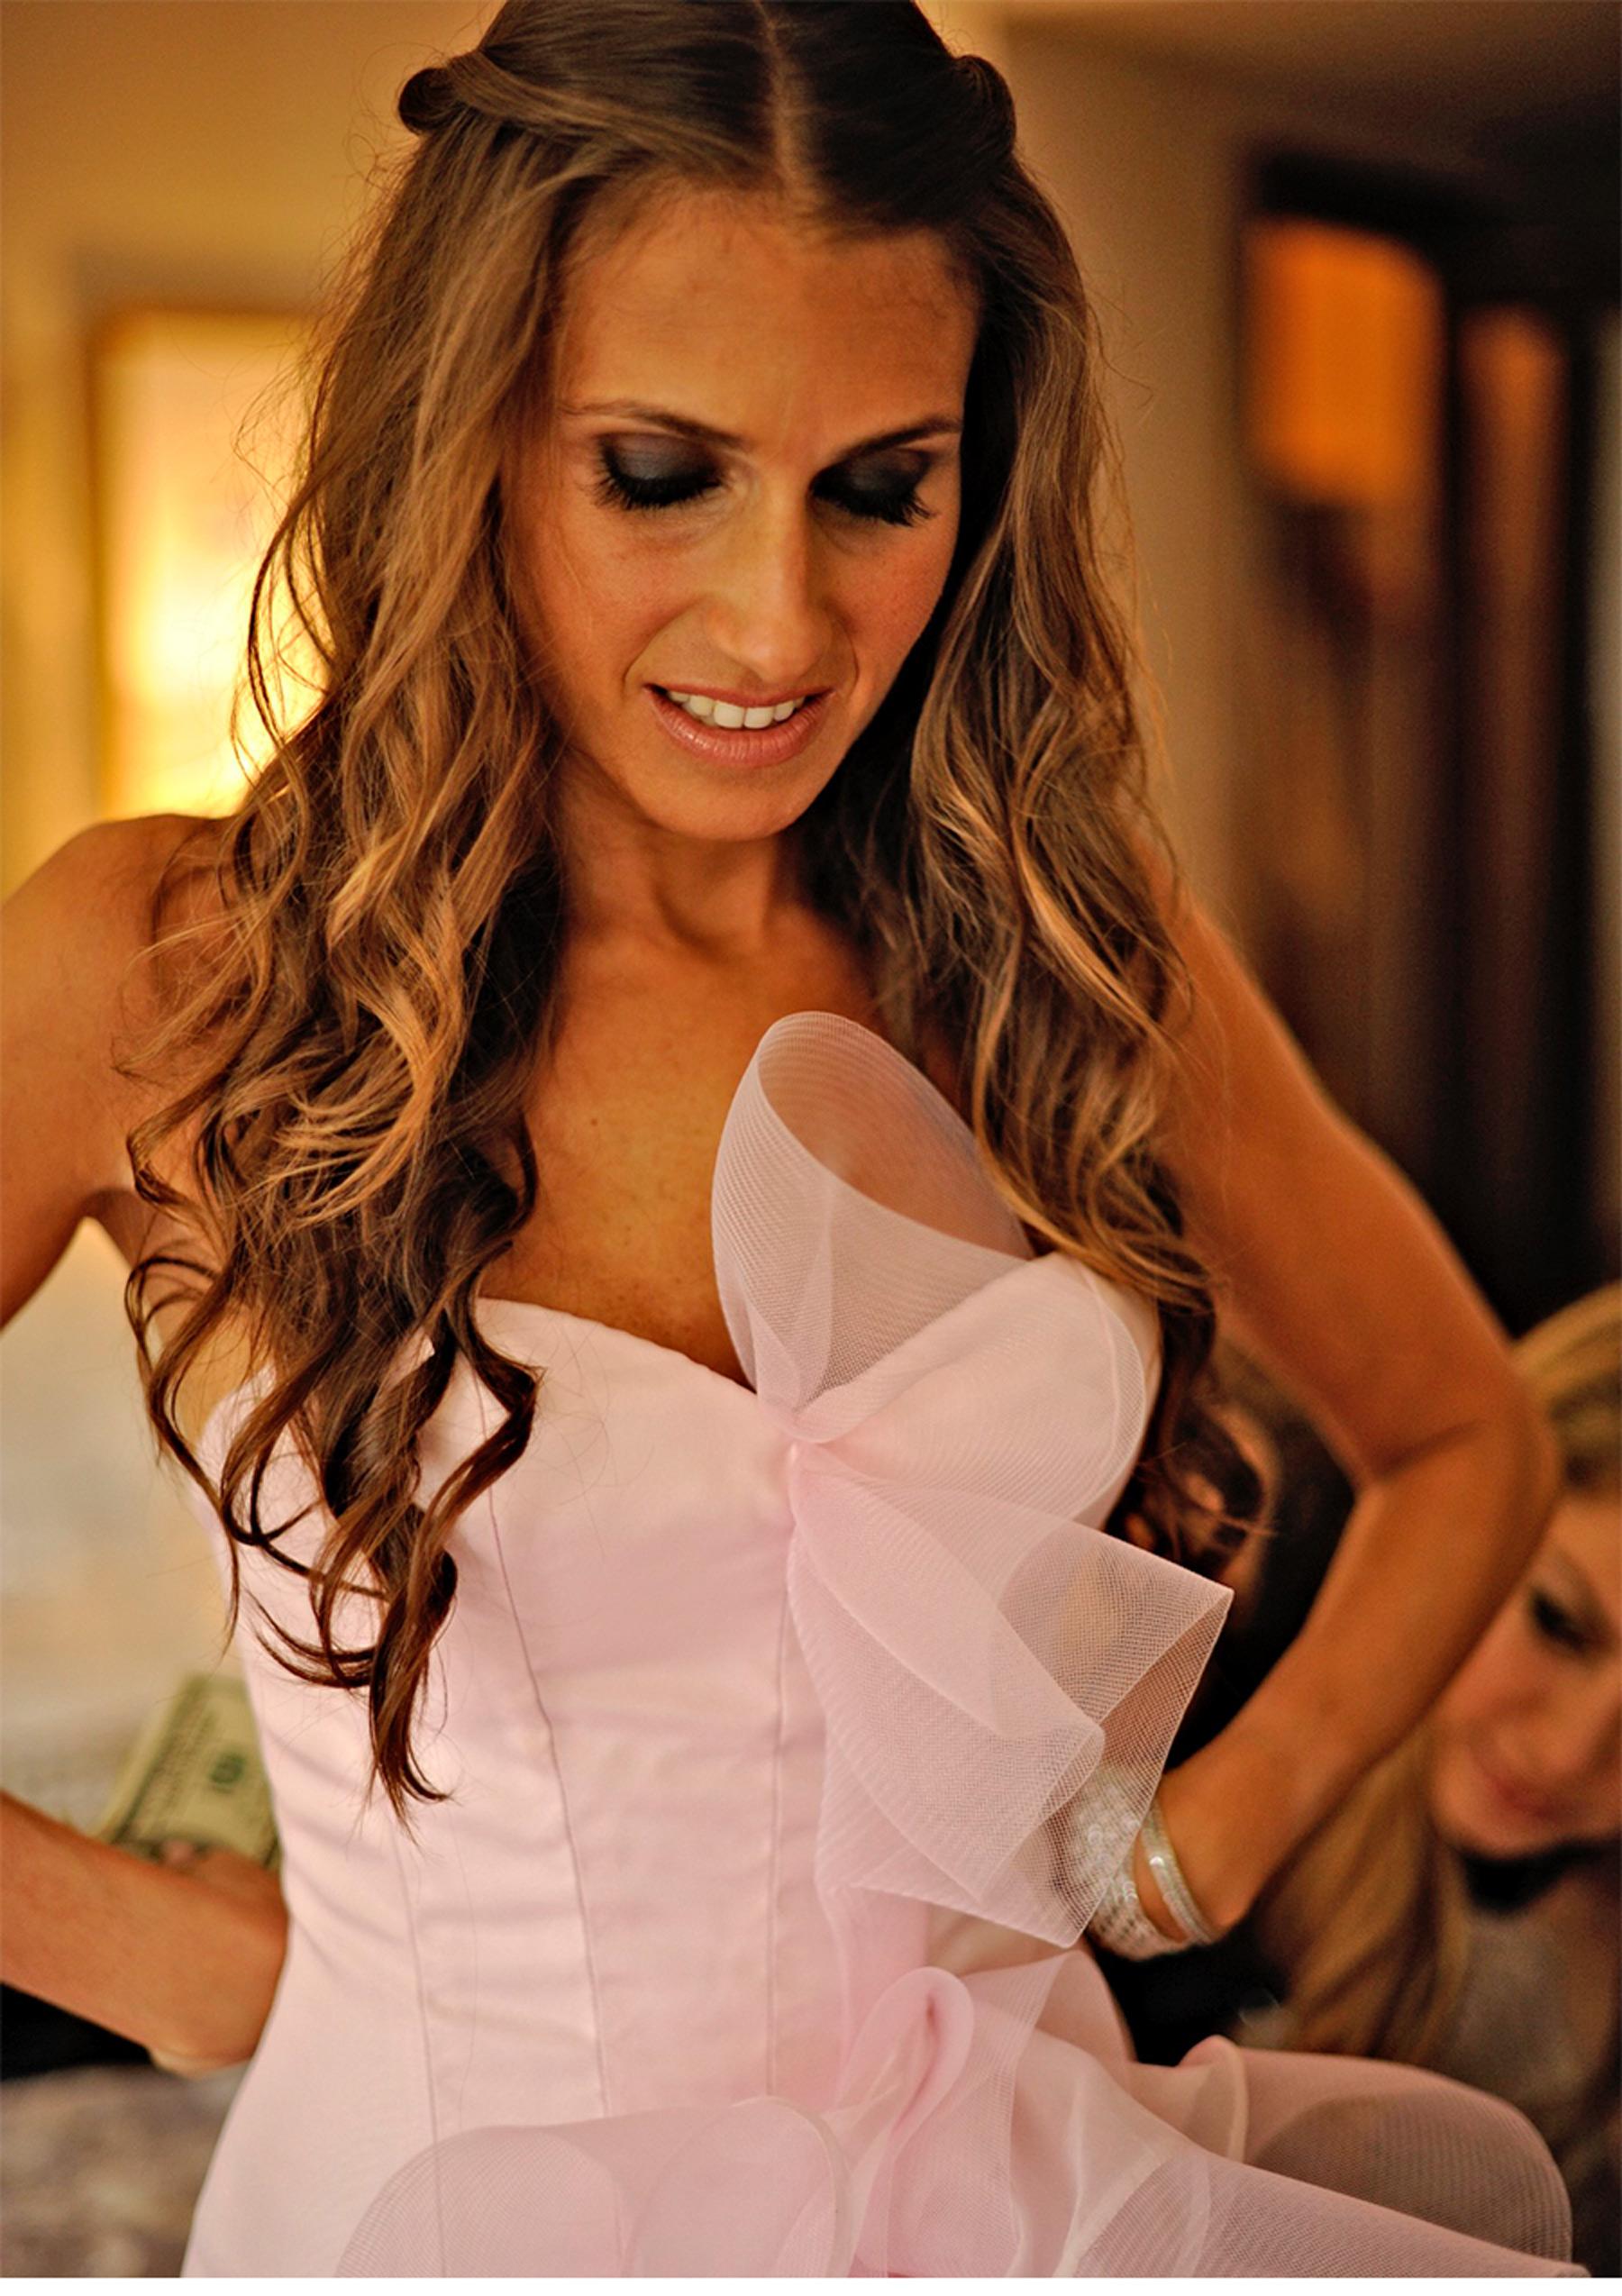 Eva marie nelson wedding